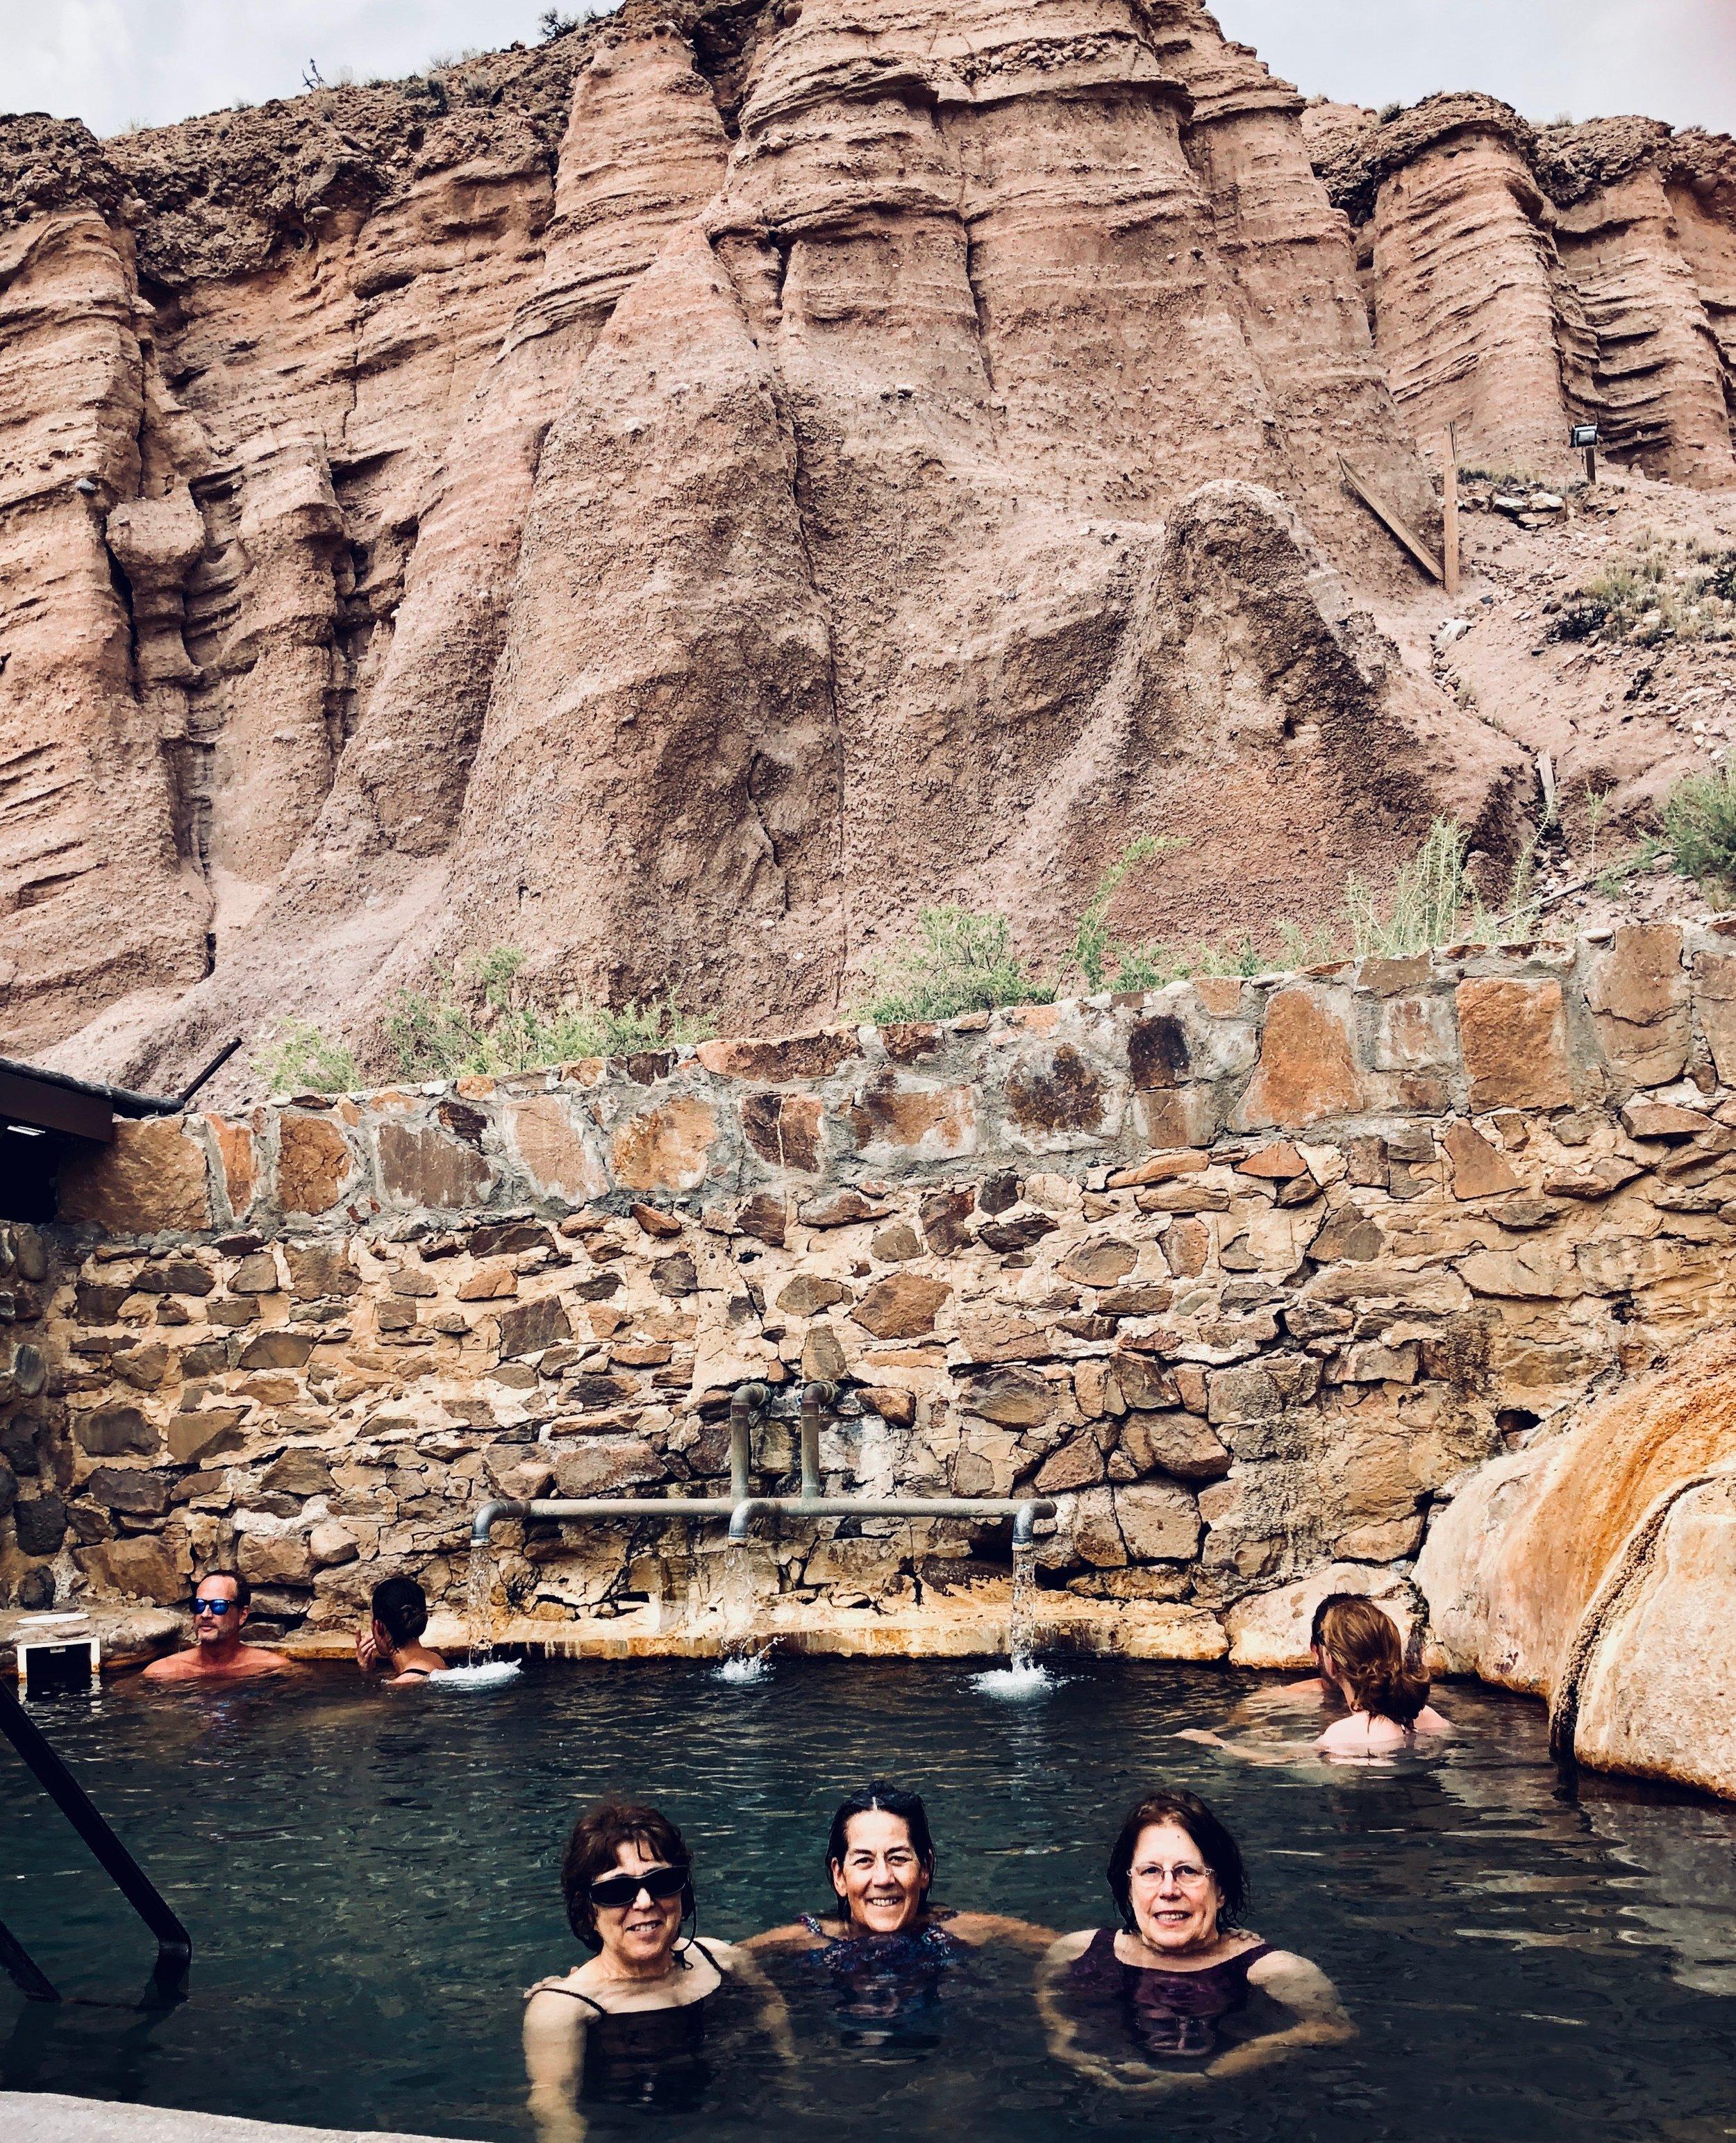 Ojo Caliente Mineral Hot Springs